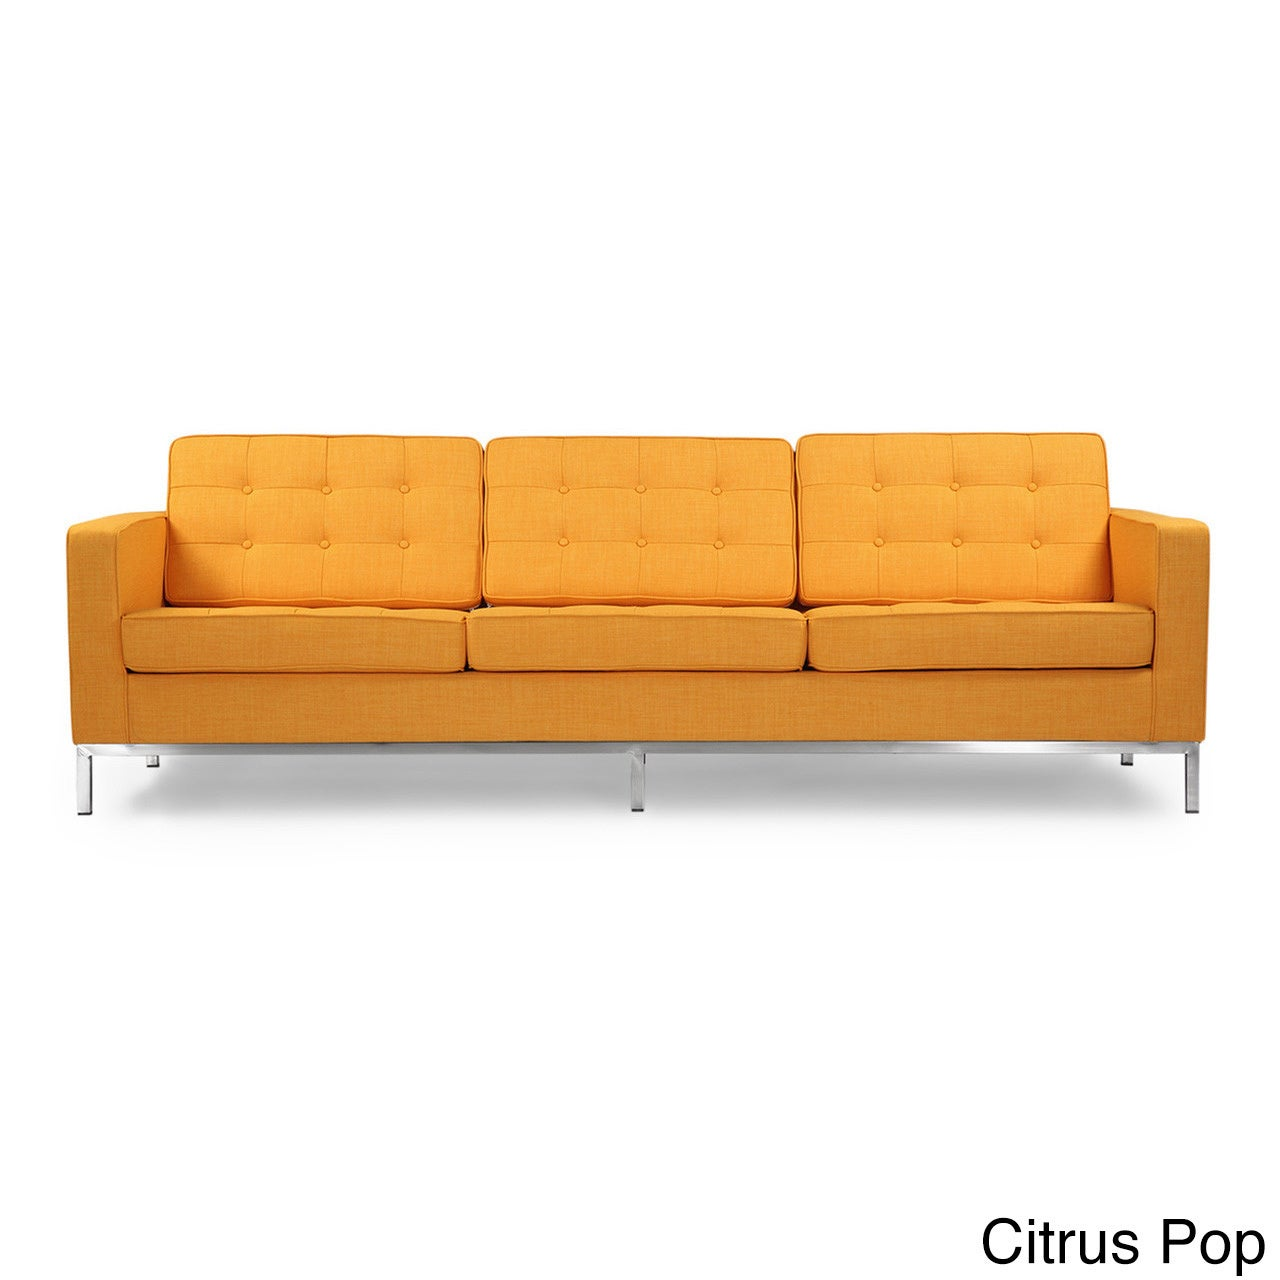 Karl Florence Knoll Style Sofa 3 Seat Premium Fabric Citrus Pop Vintage